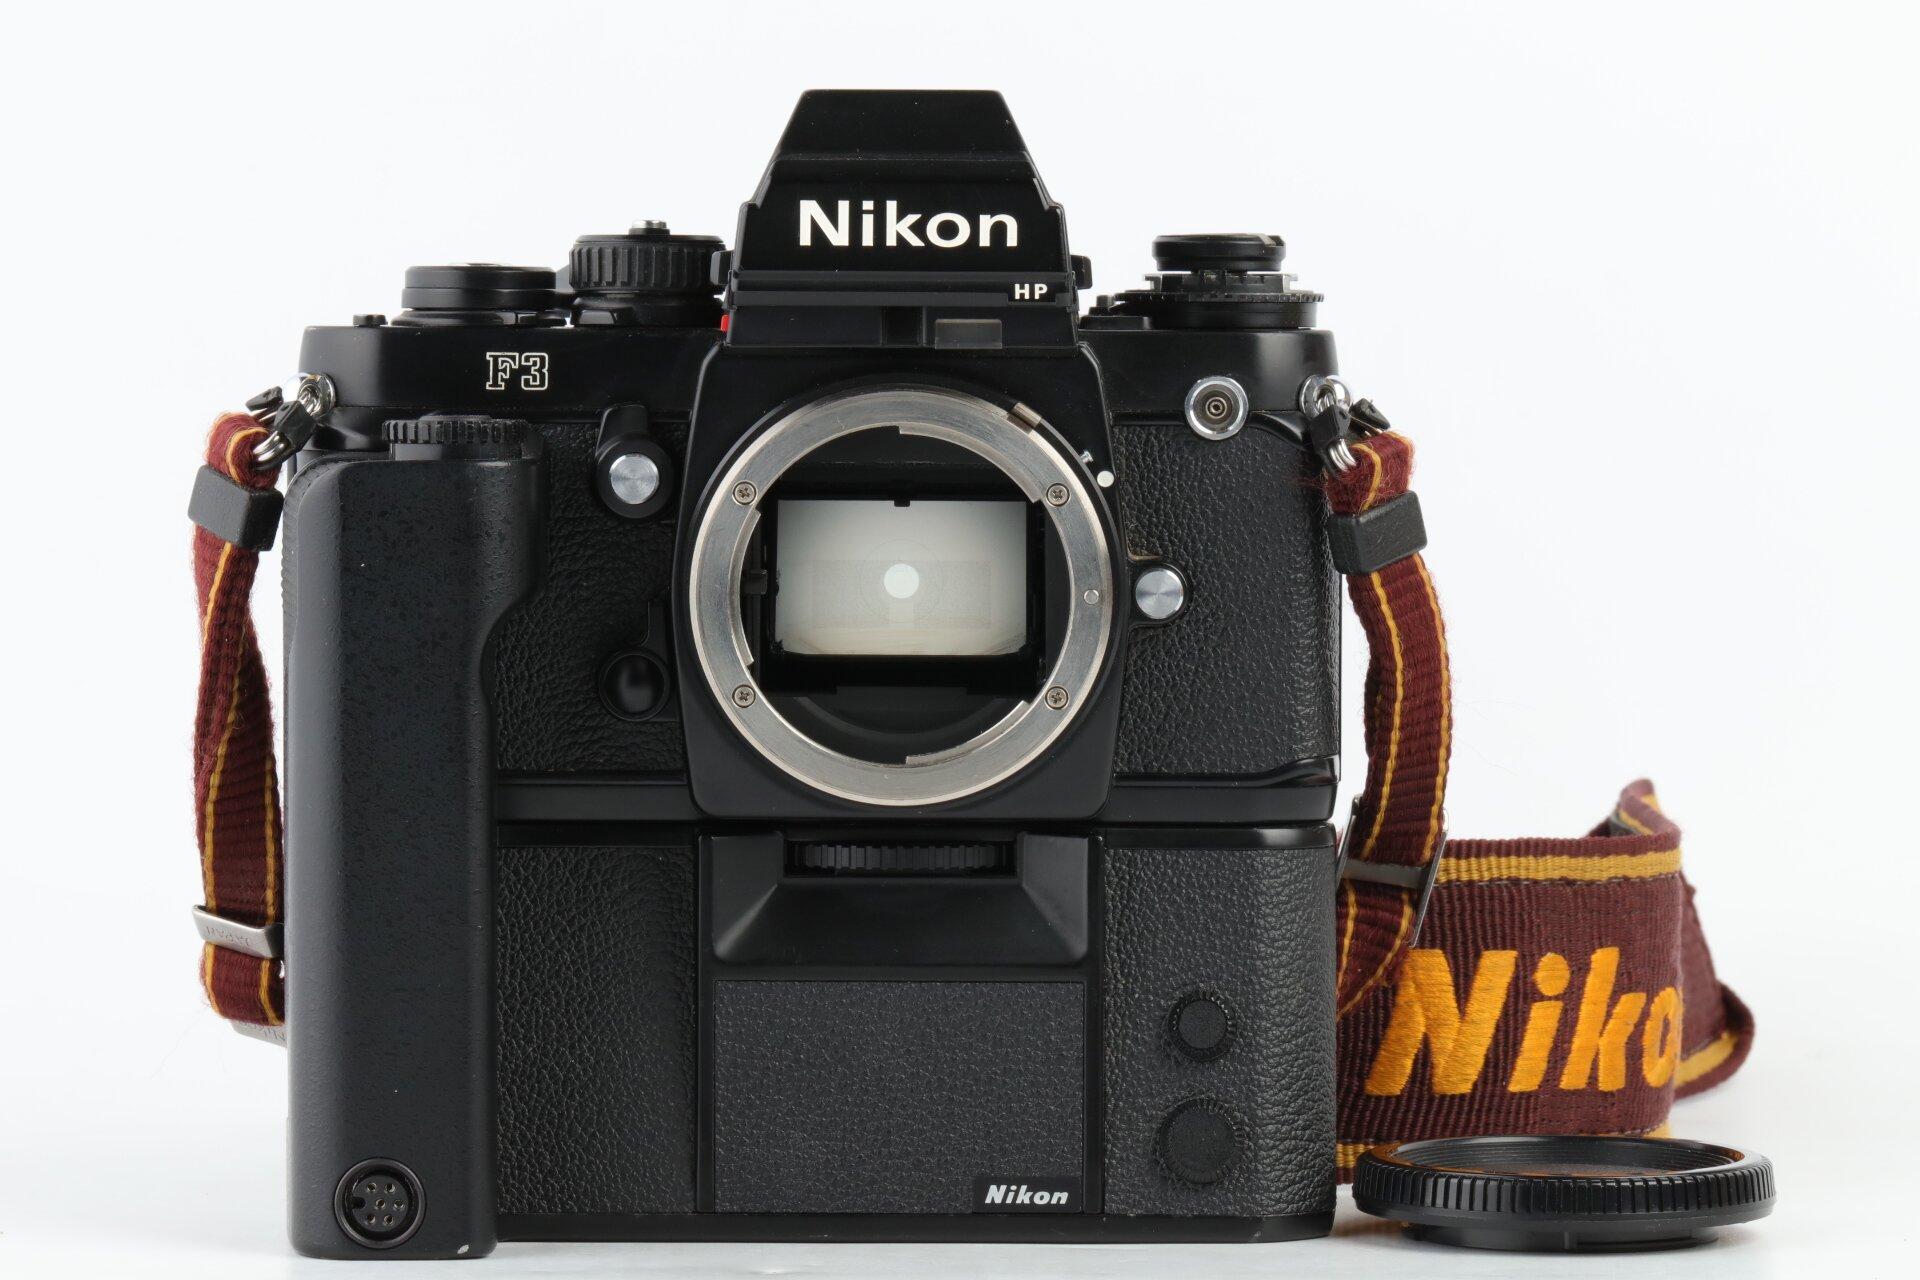 Nikon F3 HP Gehäuse + MD-4 Motor Drive